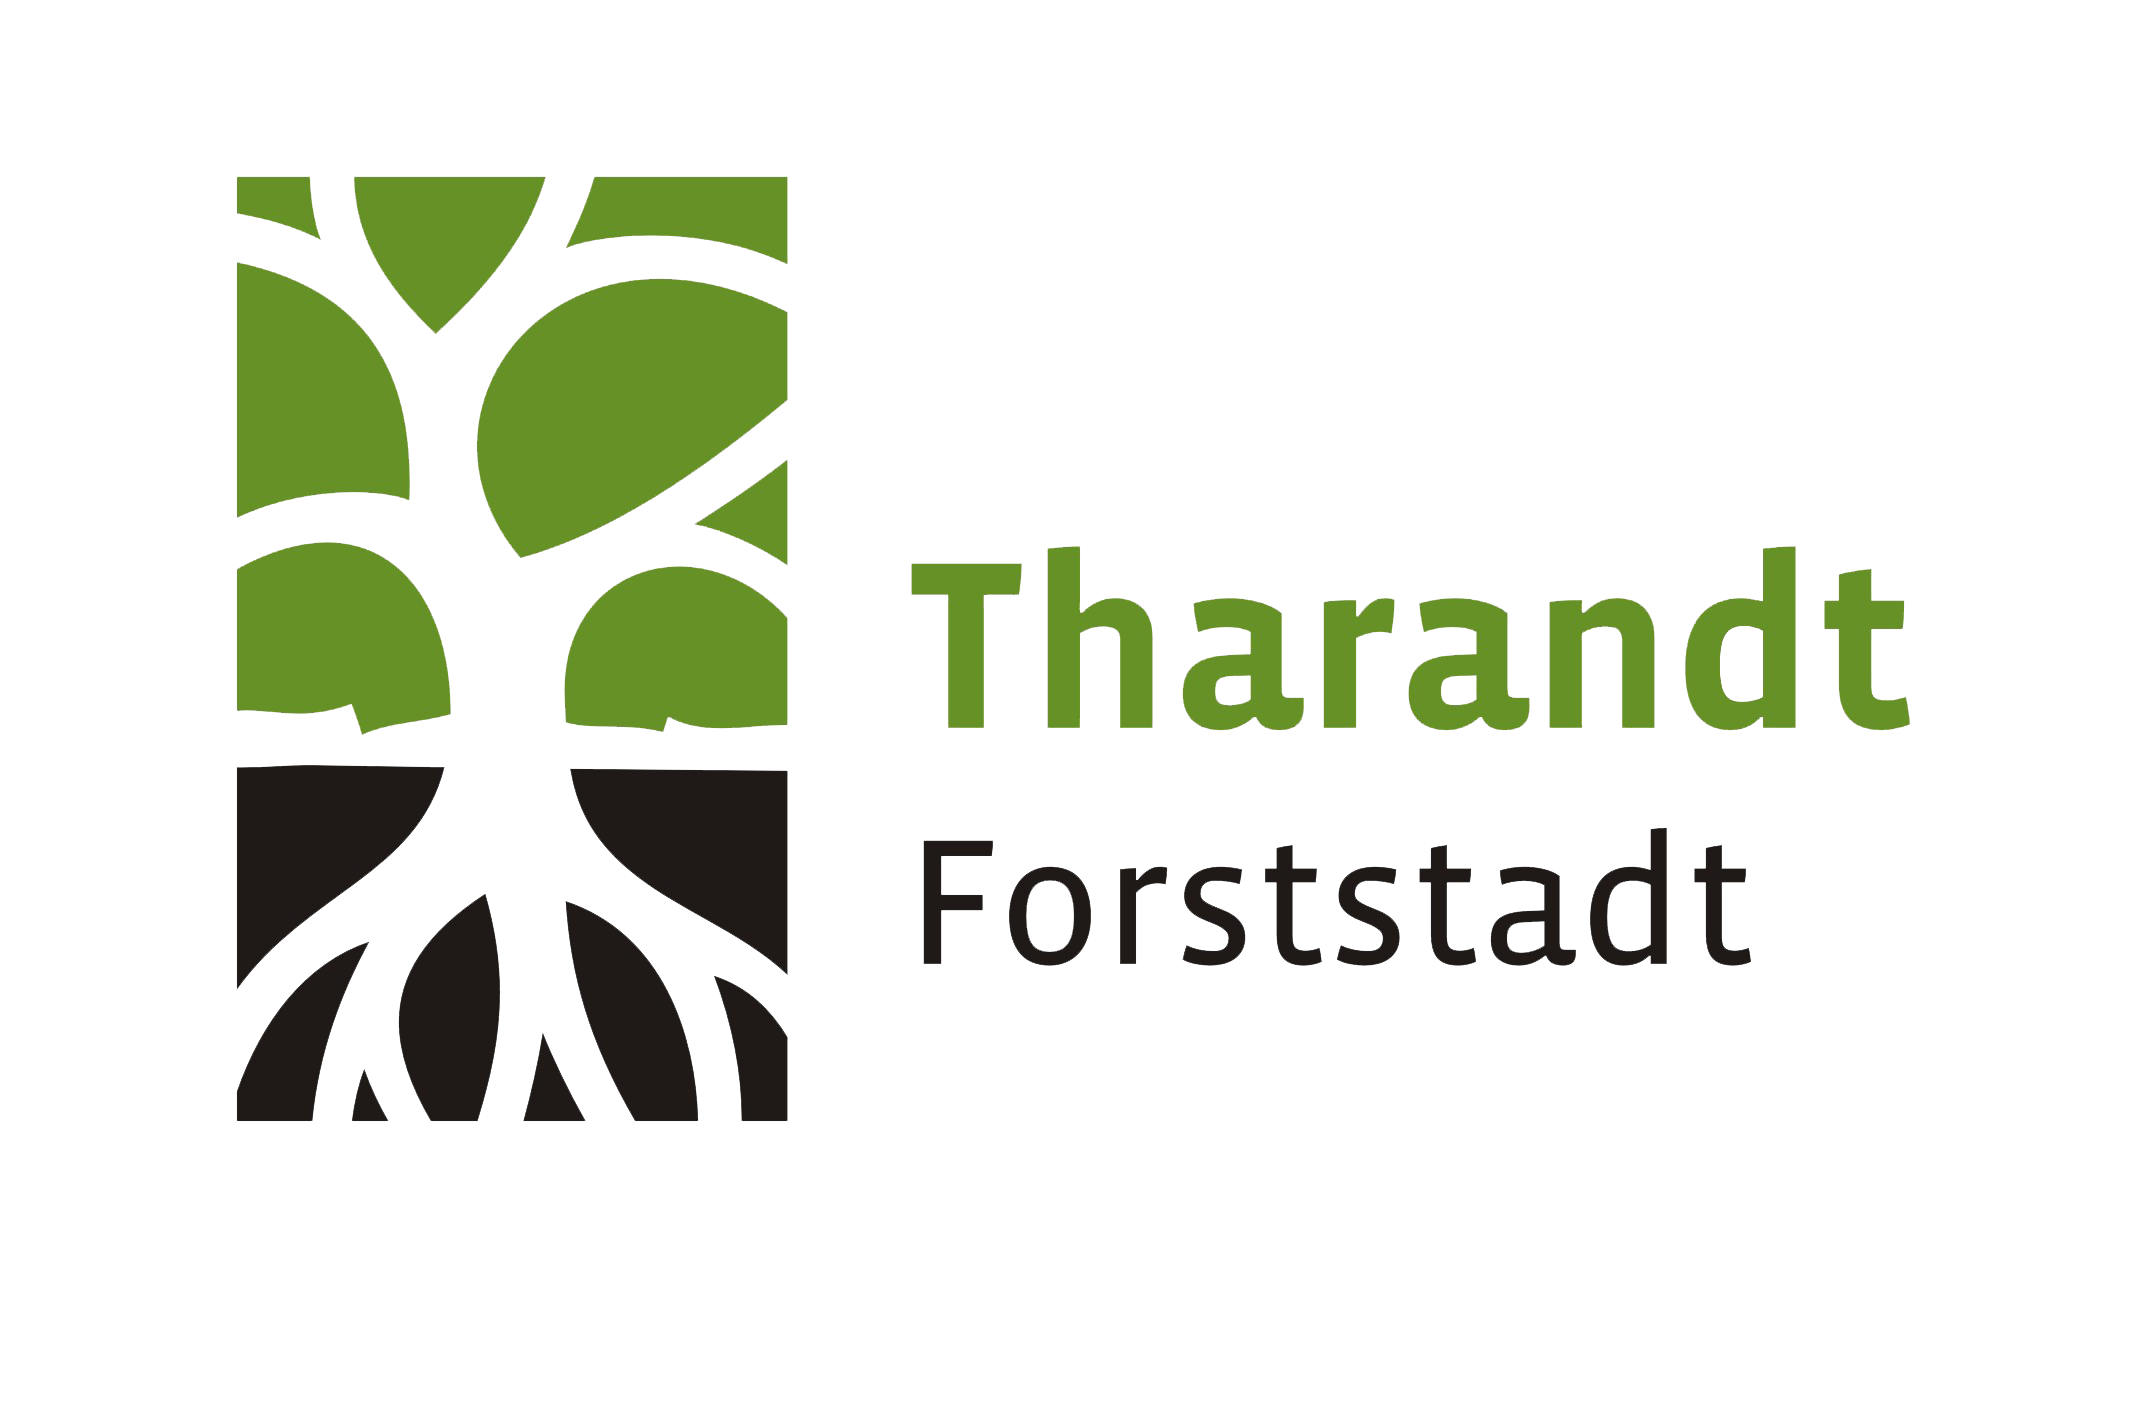 Stadt Tharandt